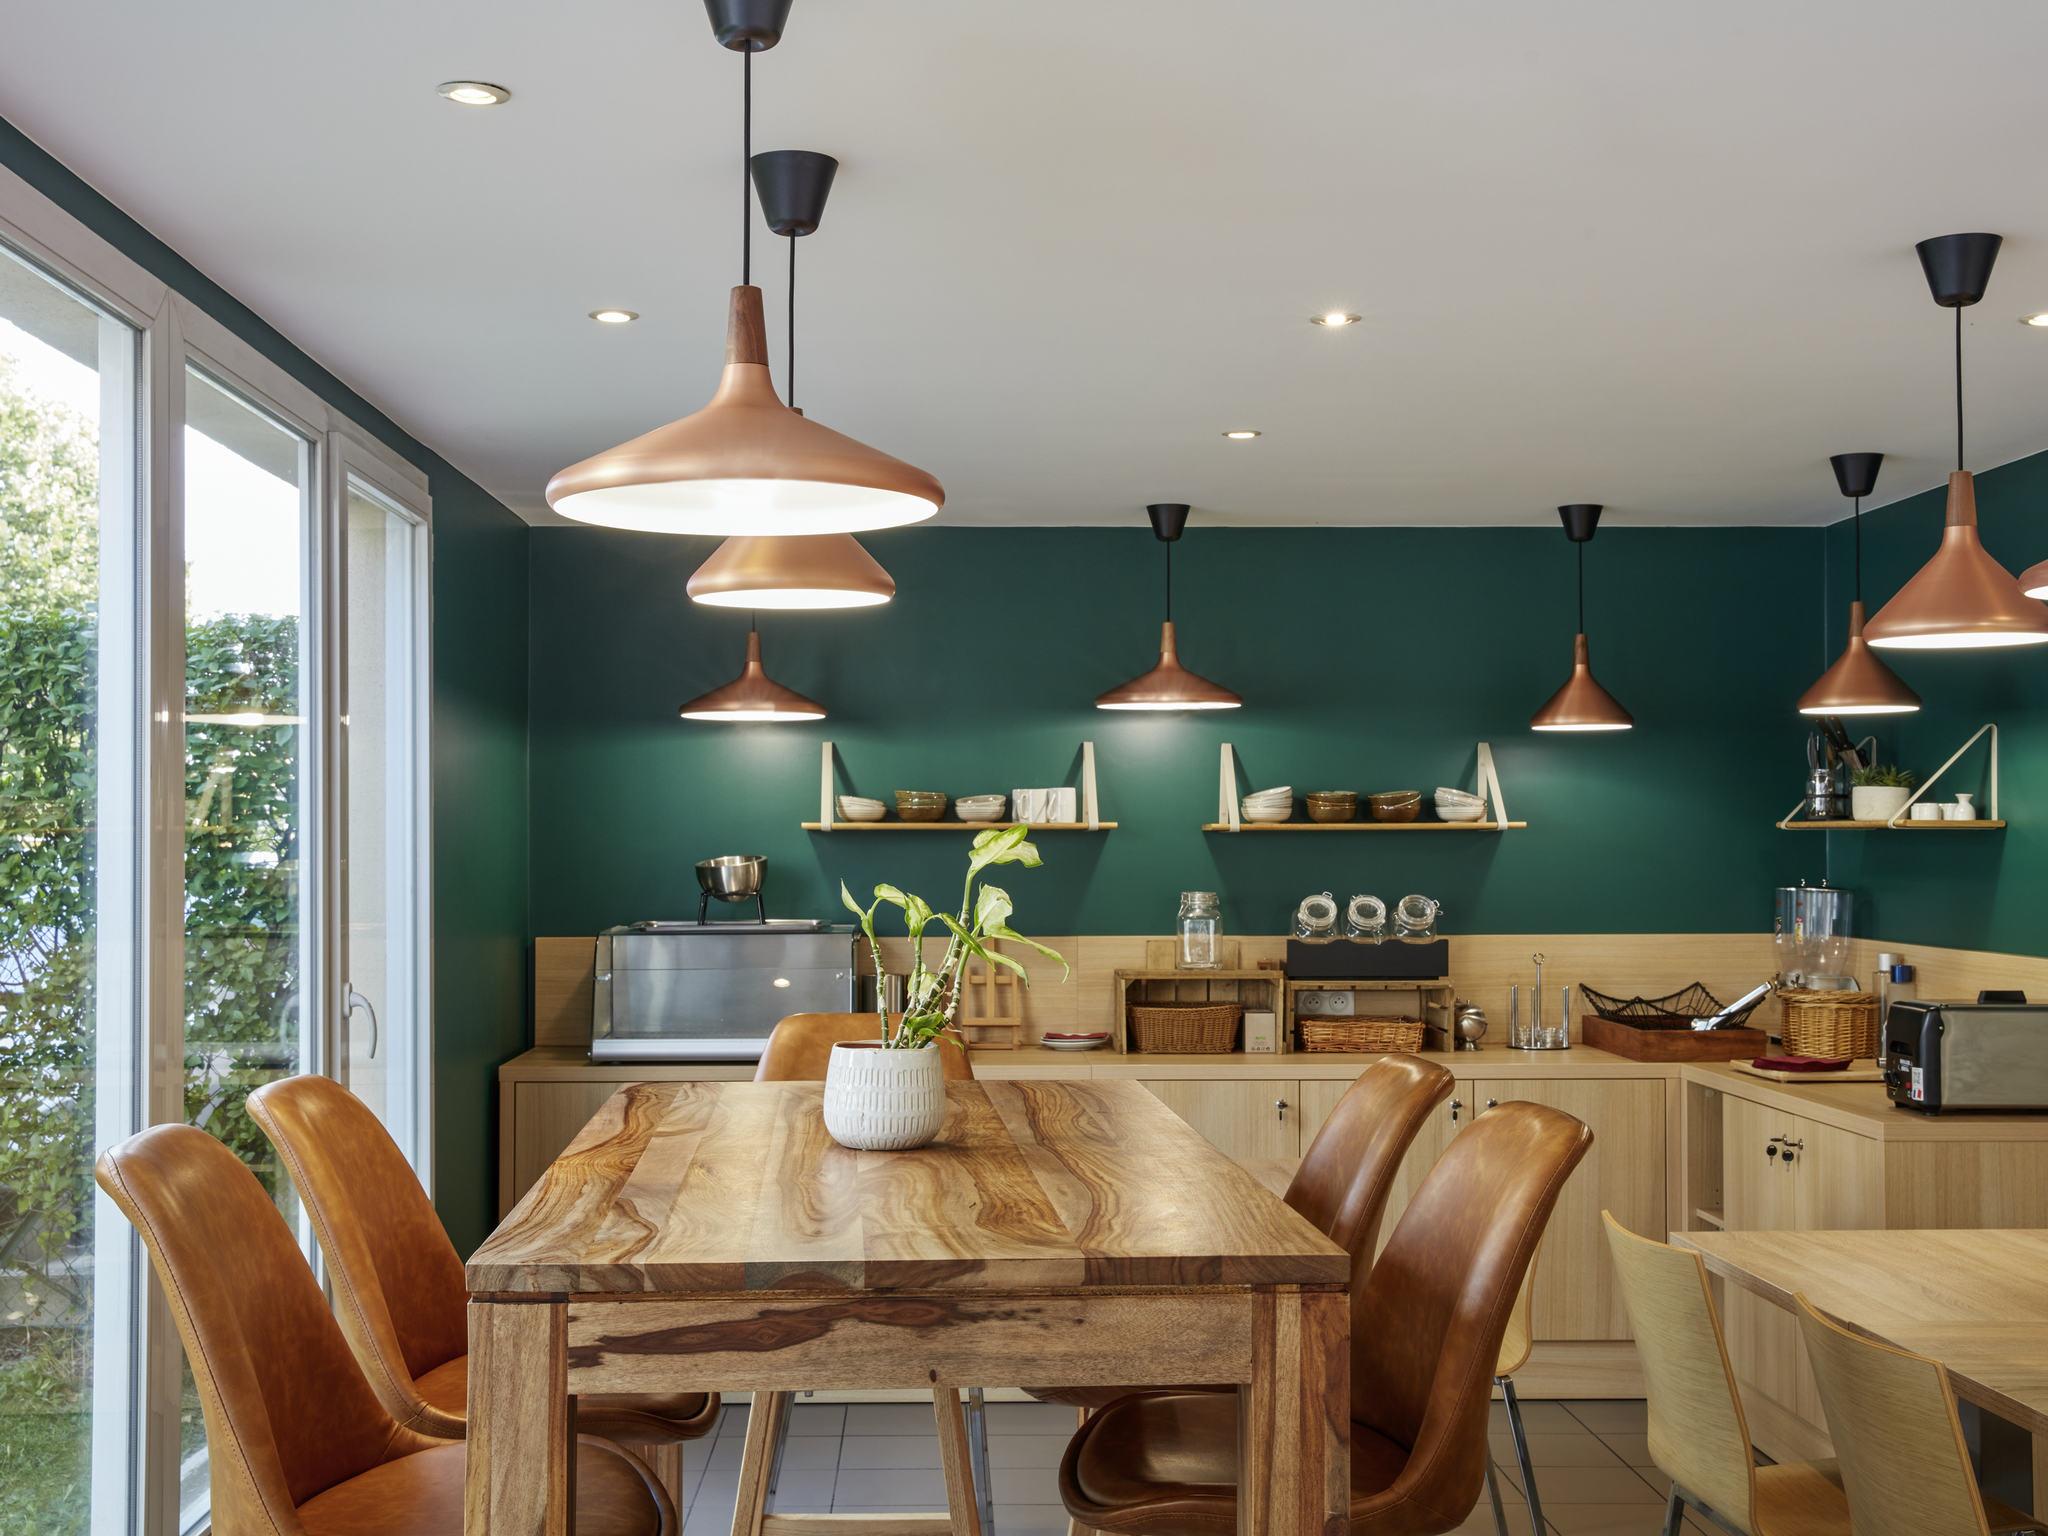 Hotel – Aparthotel Adagio access Carrières Sous Poissy